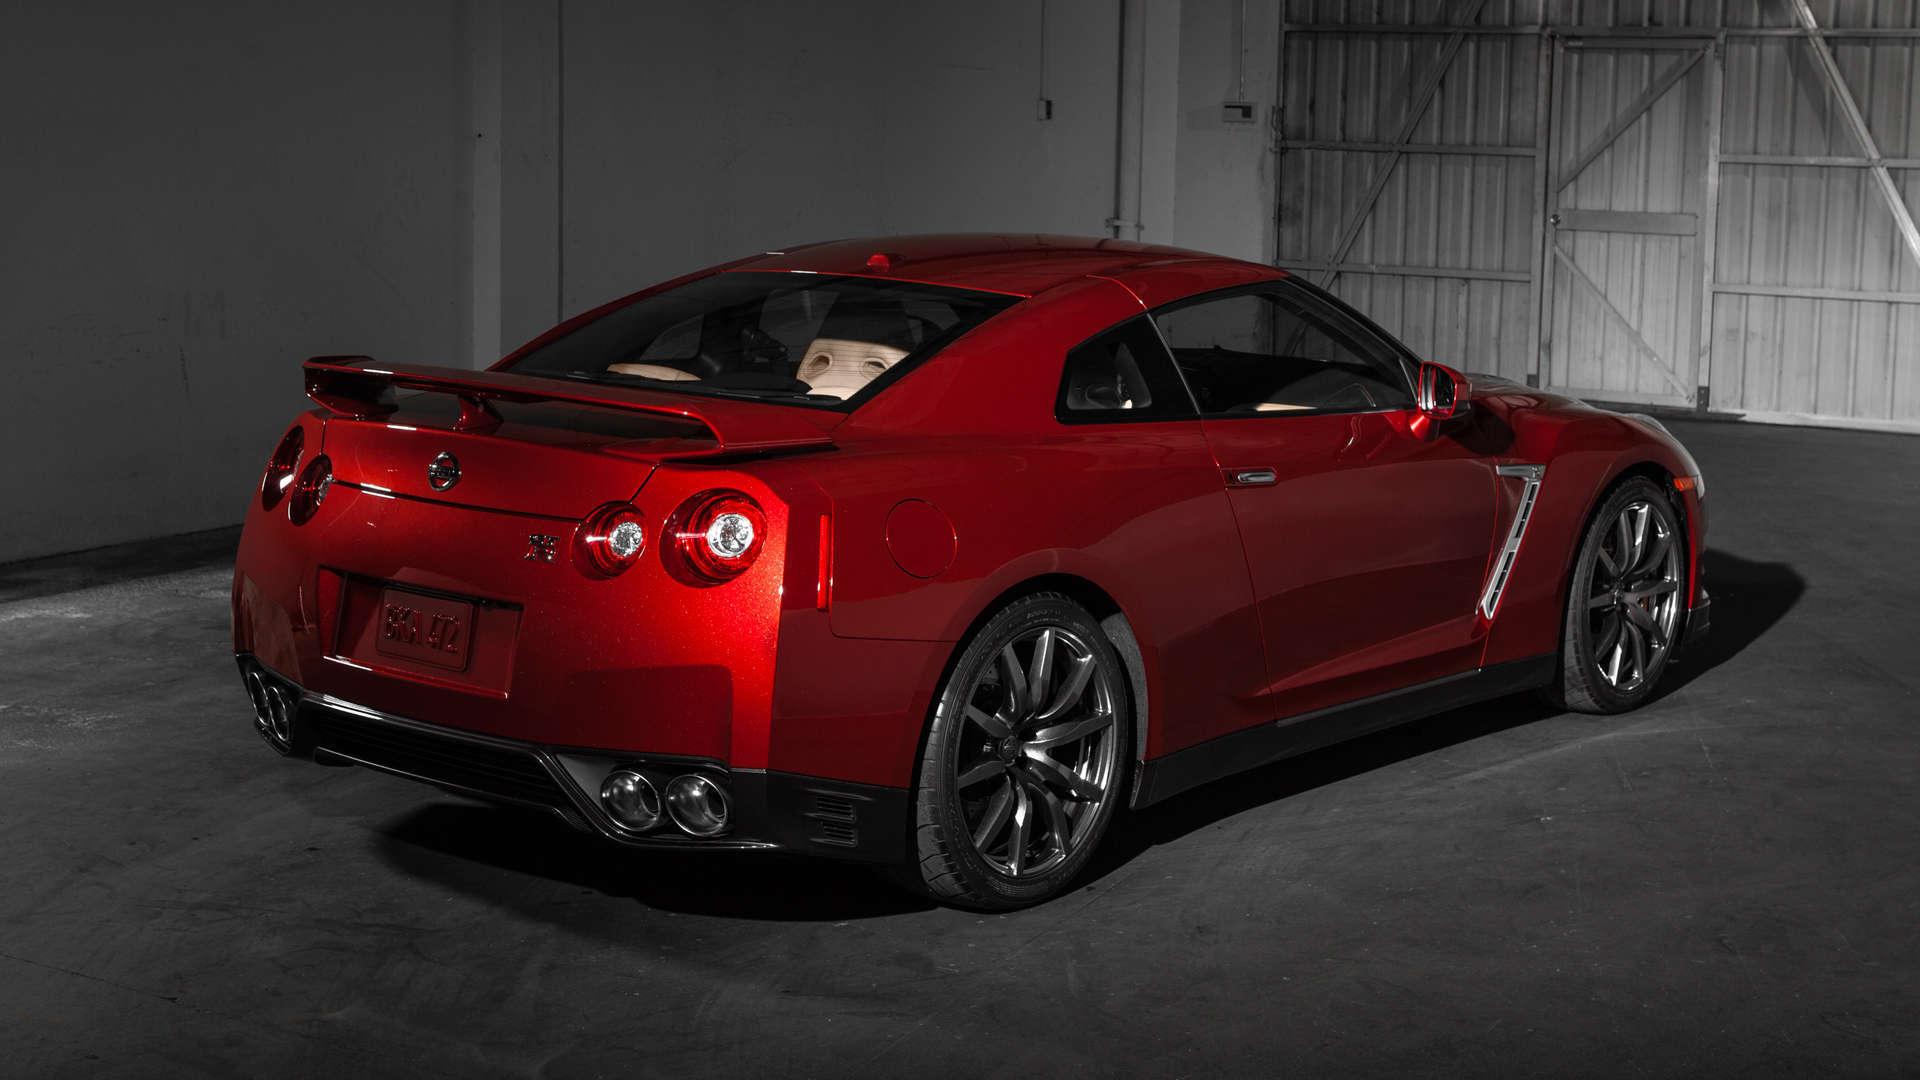 Wallpaper 2015 Nissan GT R 02 HD Wallpapers 1080p Upload at May 15 1920x1080